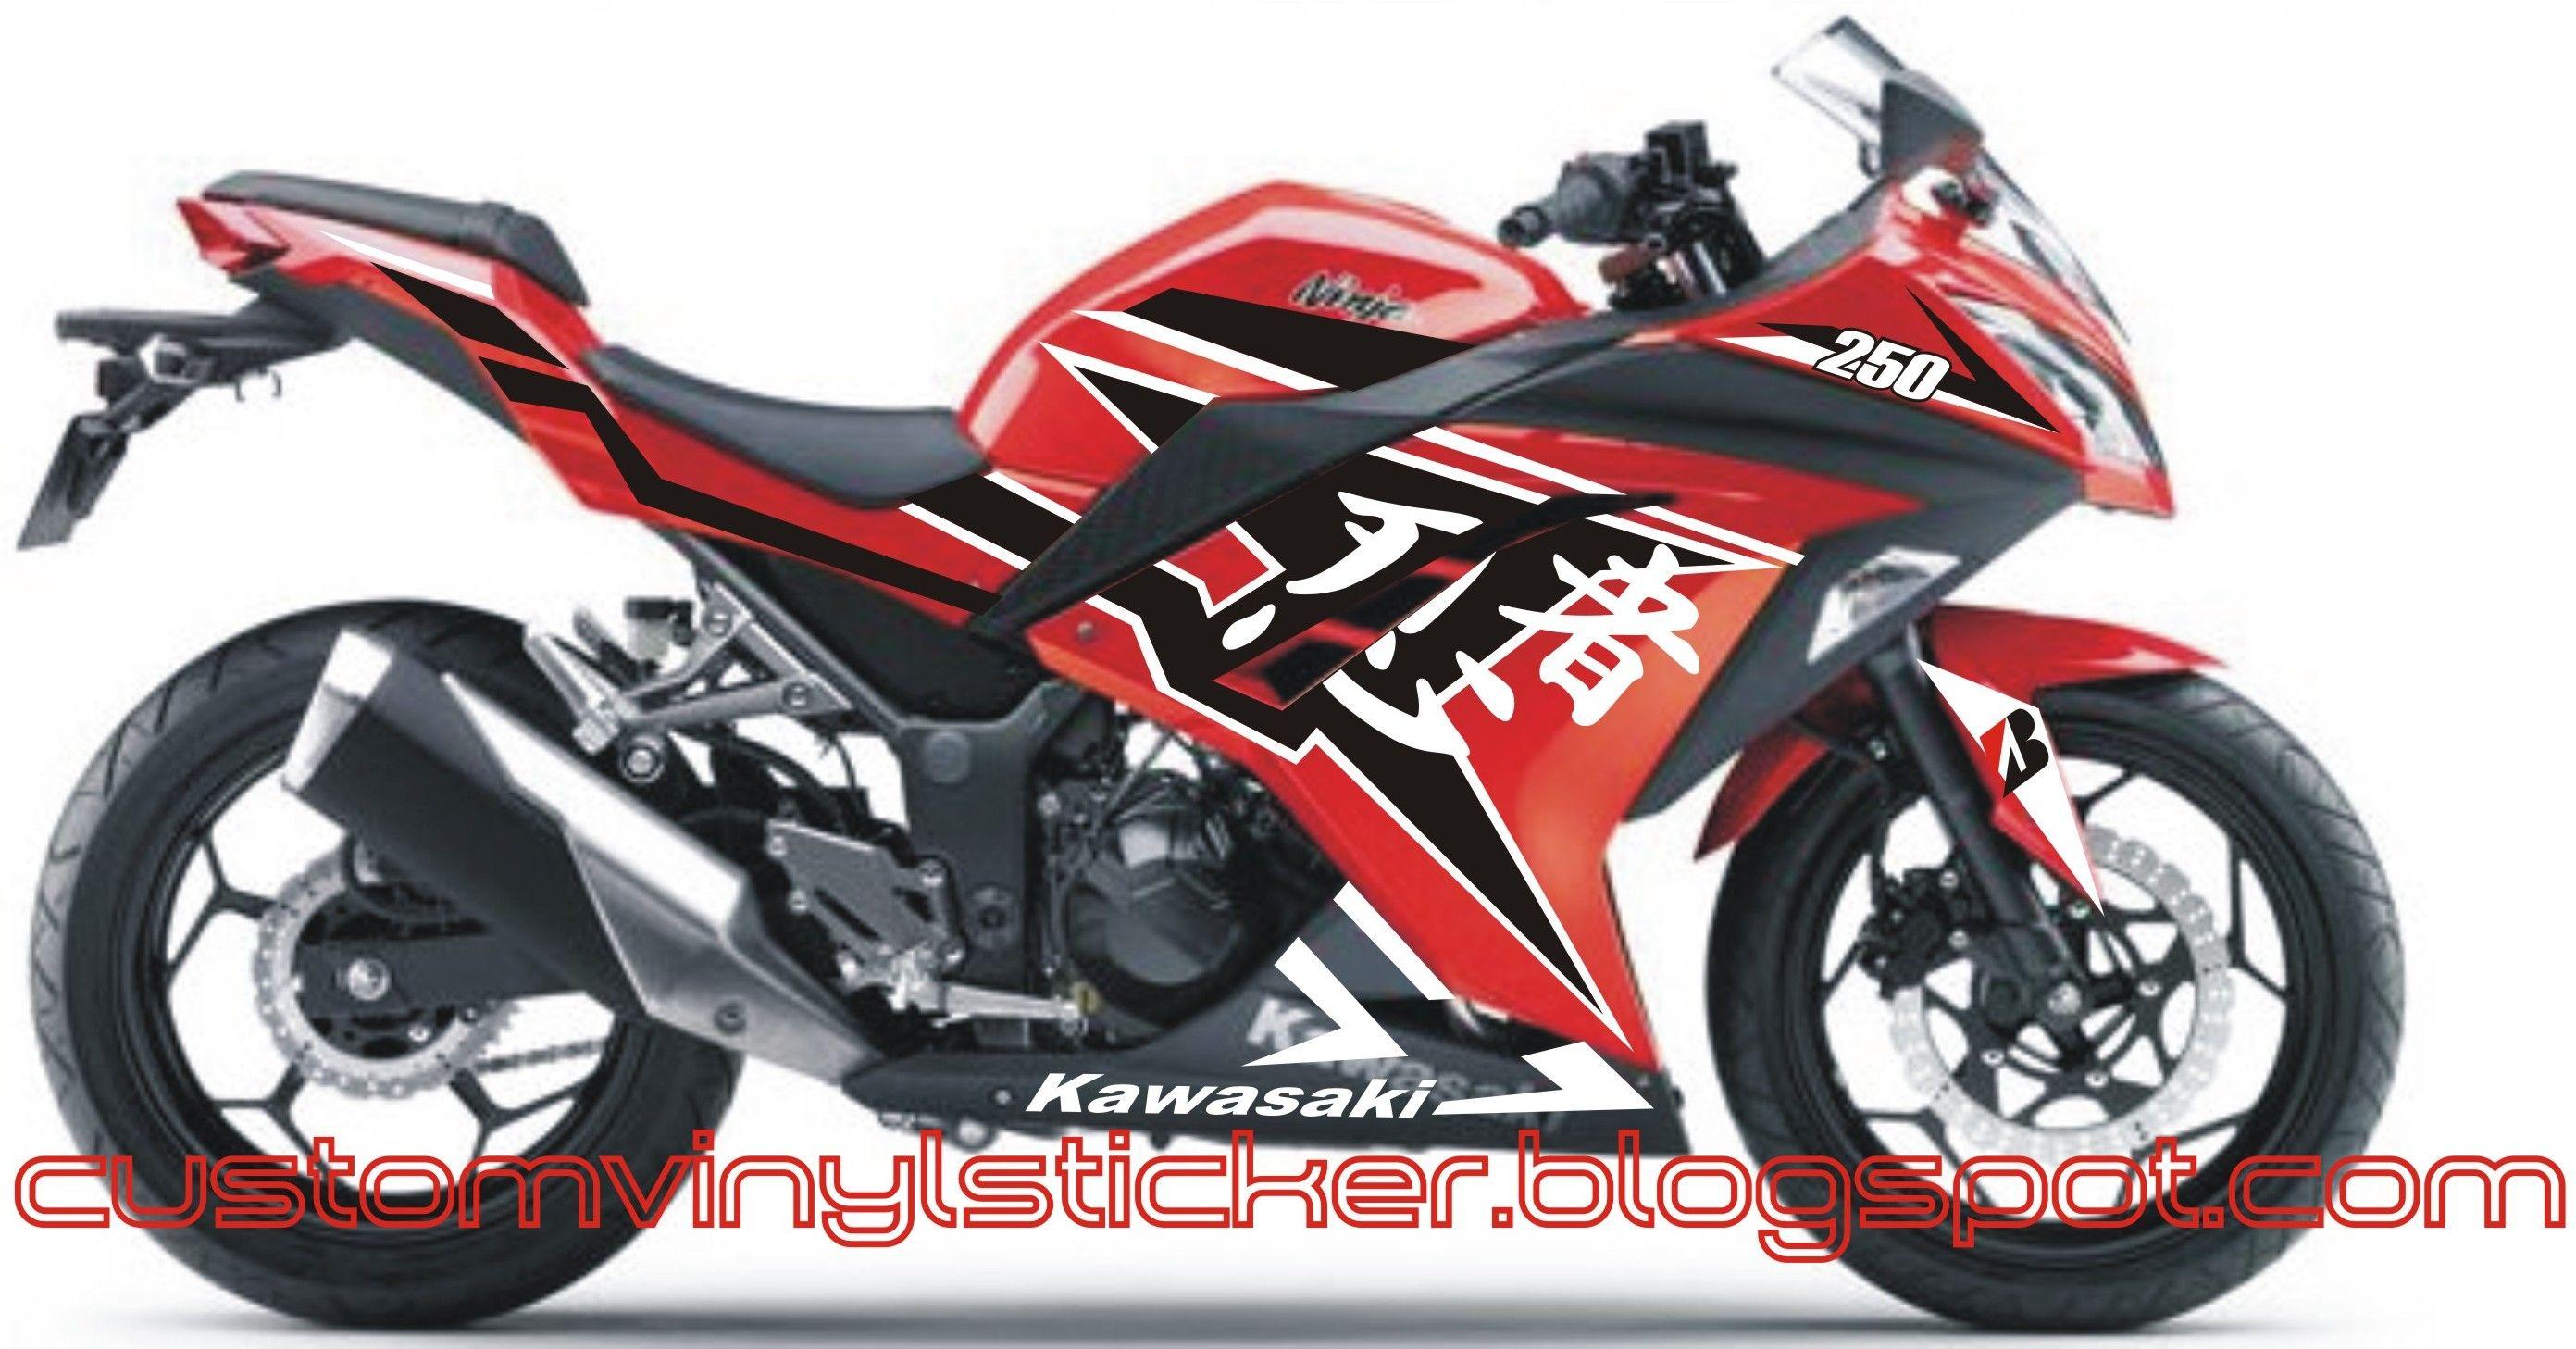 Design sticker ninja 250 - Kawasaki Ninja 250 F1 Red Ninjutsu Custom Sticker Concept